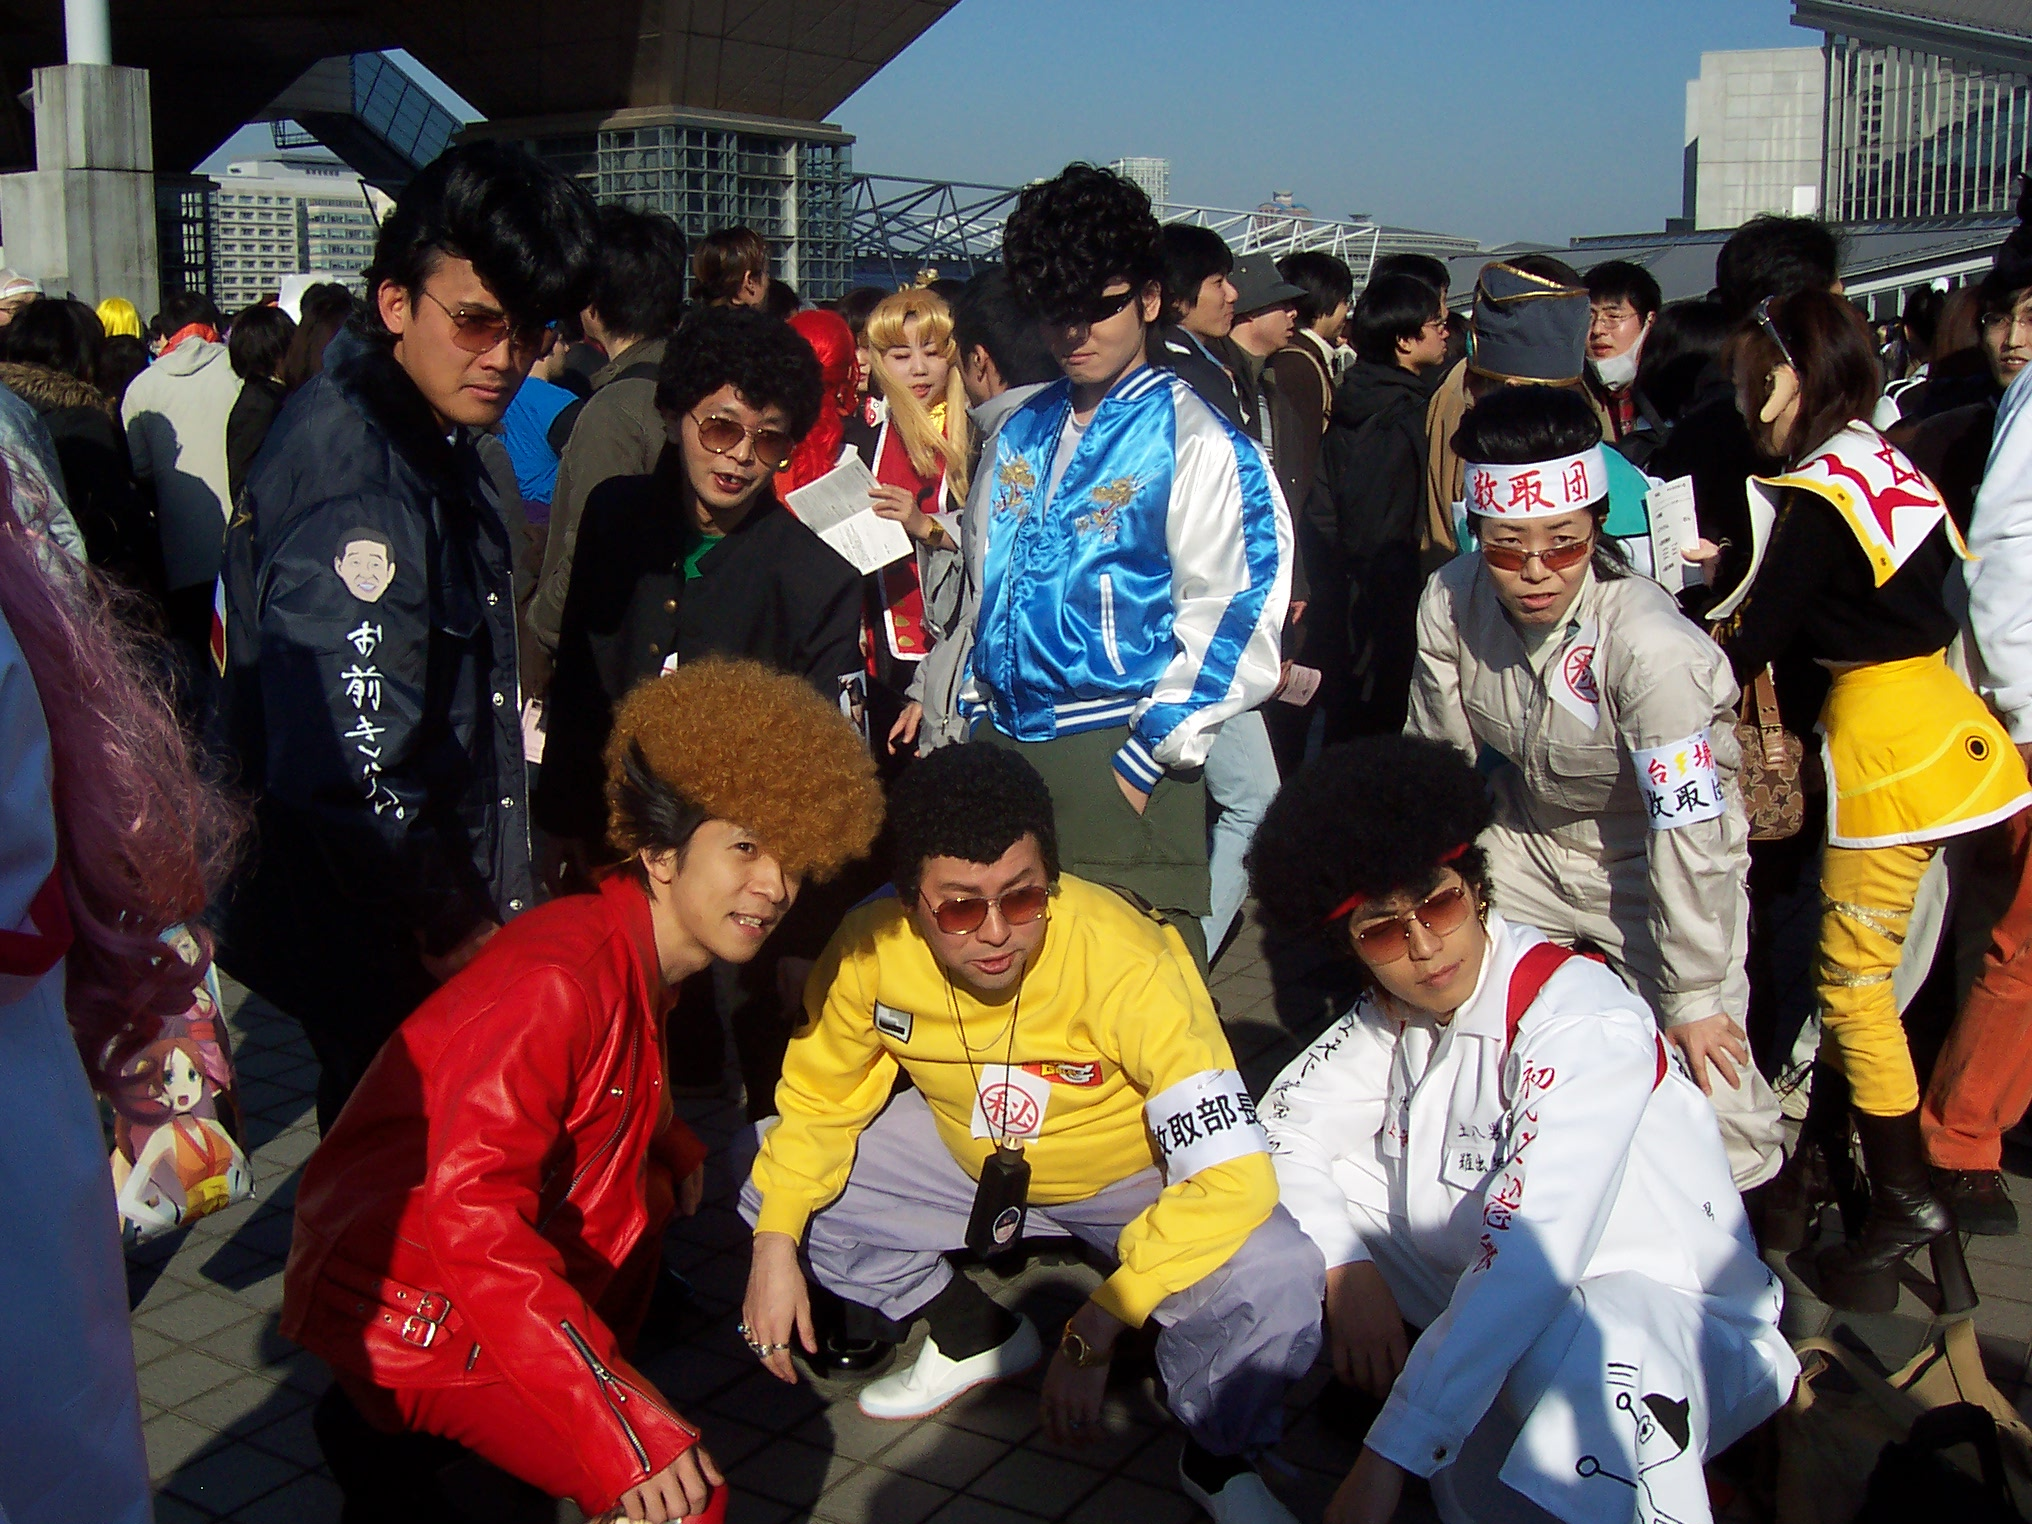 https://i1.wp.com/upload.wikimedia.org/wikipedia/commons/2/23/JapaneseBosozoku.jpg